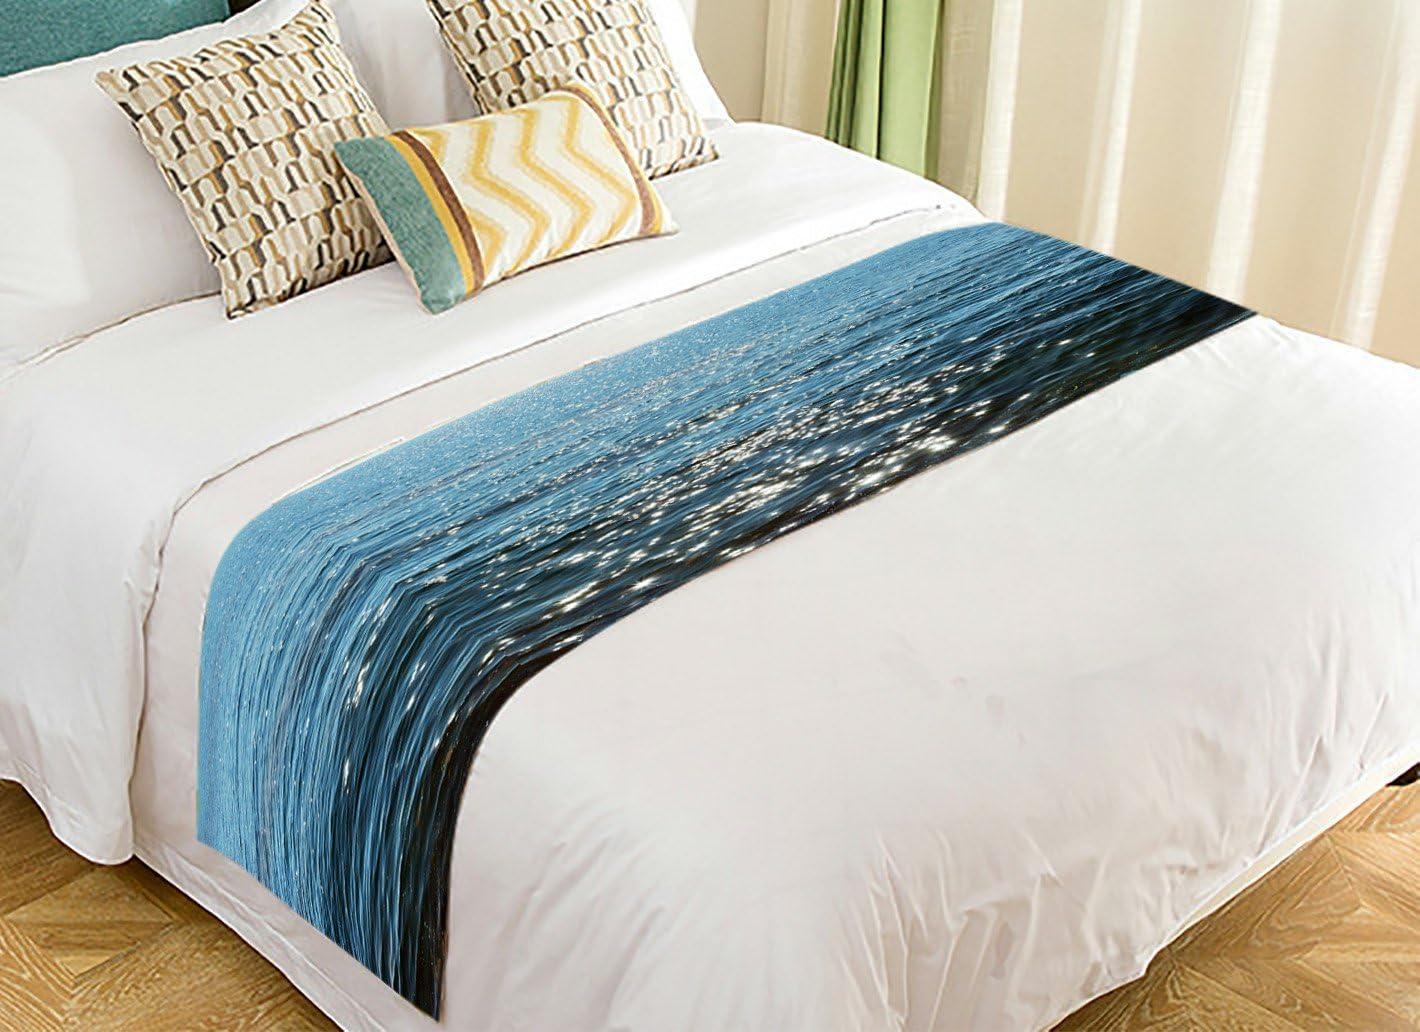 Finally popular brand PicaqiuXzzz Custom Beach Theme Max 83% OFF Bed Runner Sea Ocean Blue W Deep